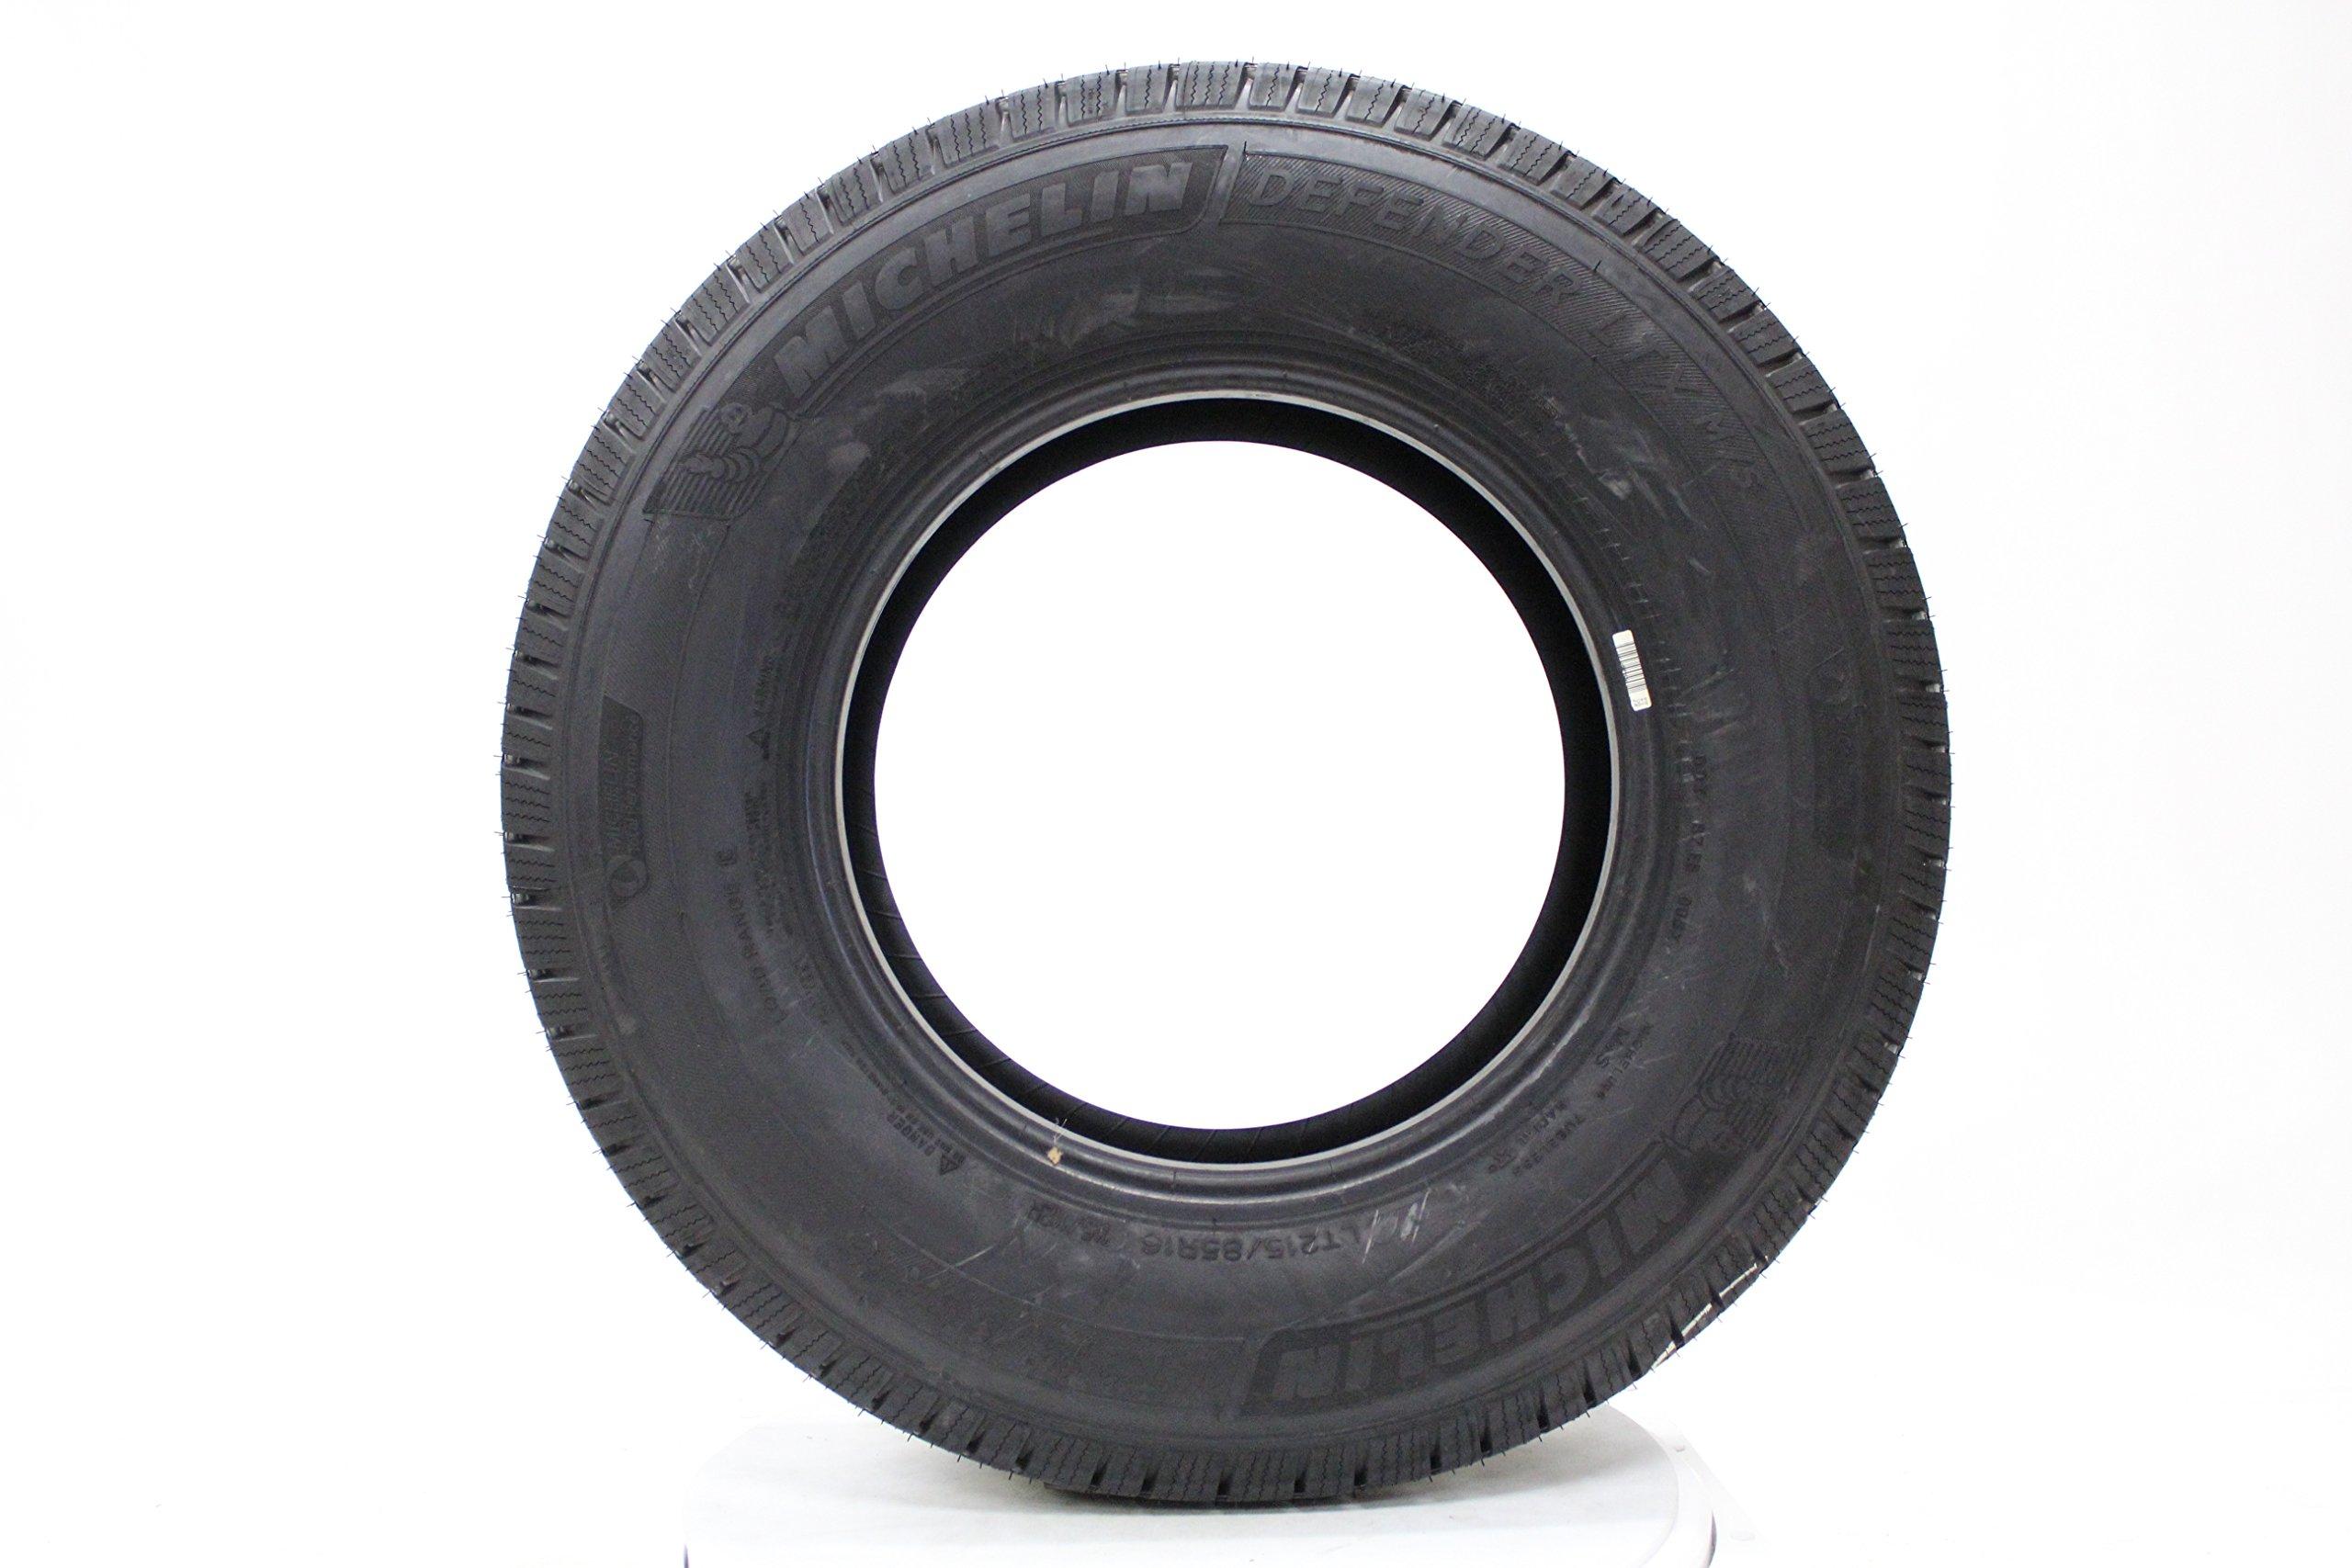 Michelin Defender LTX M/S All Season Radial Car Tire for Light Trucks, SUVs and Crossovers, 235/70R16/XL 109T